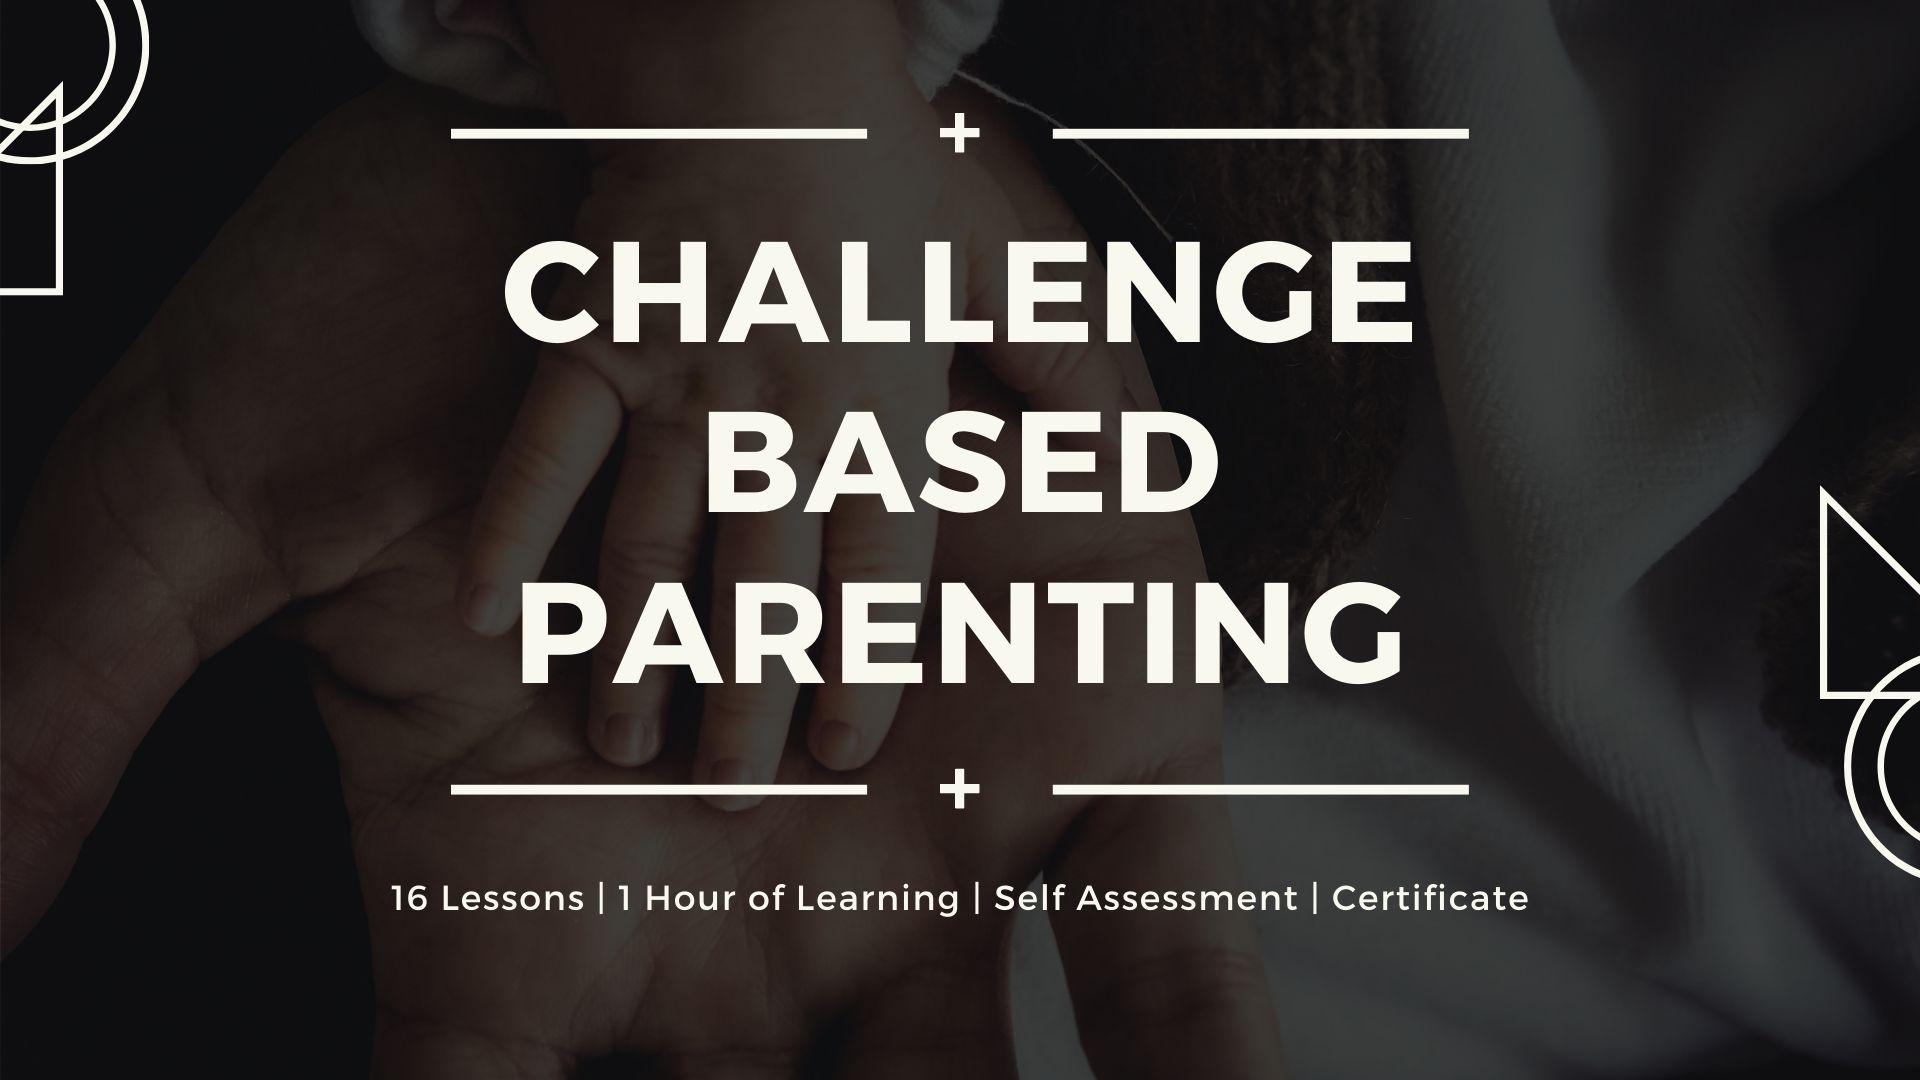 Challenge based parenting course image goedu